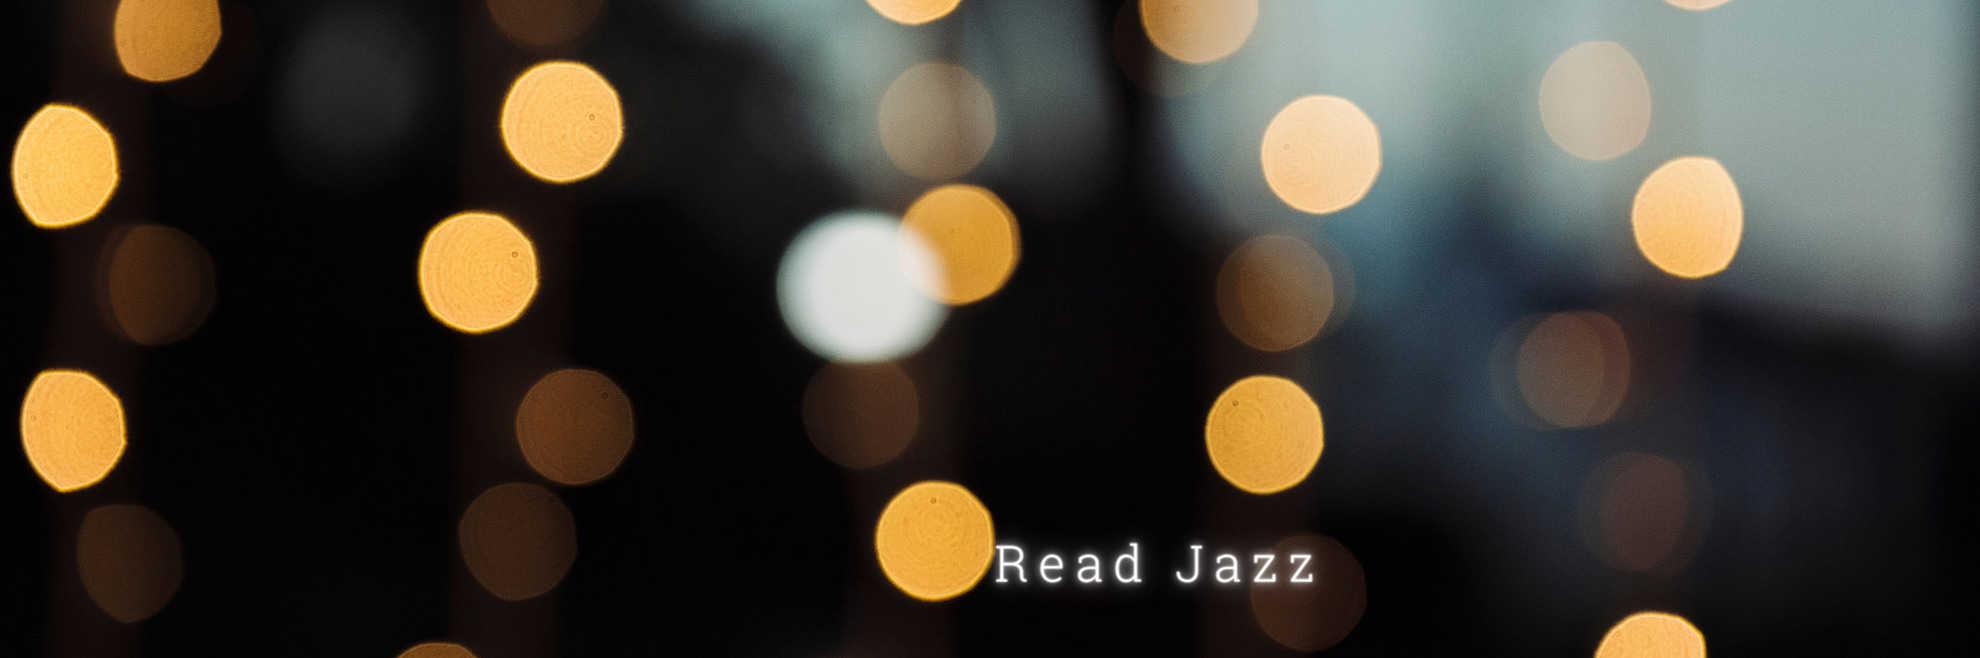 Read Jazz 嚼世人蔘 - 預設精選圖片